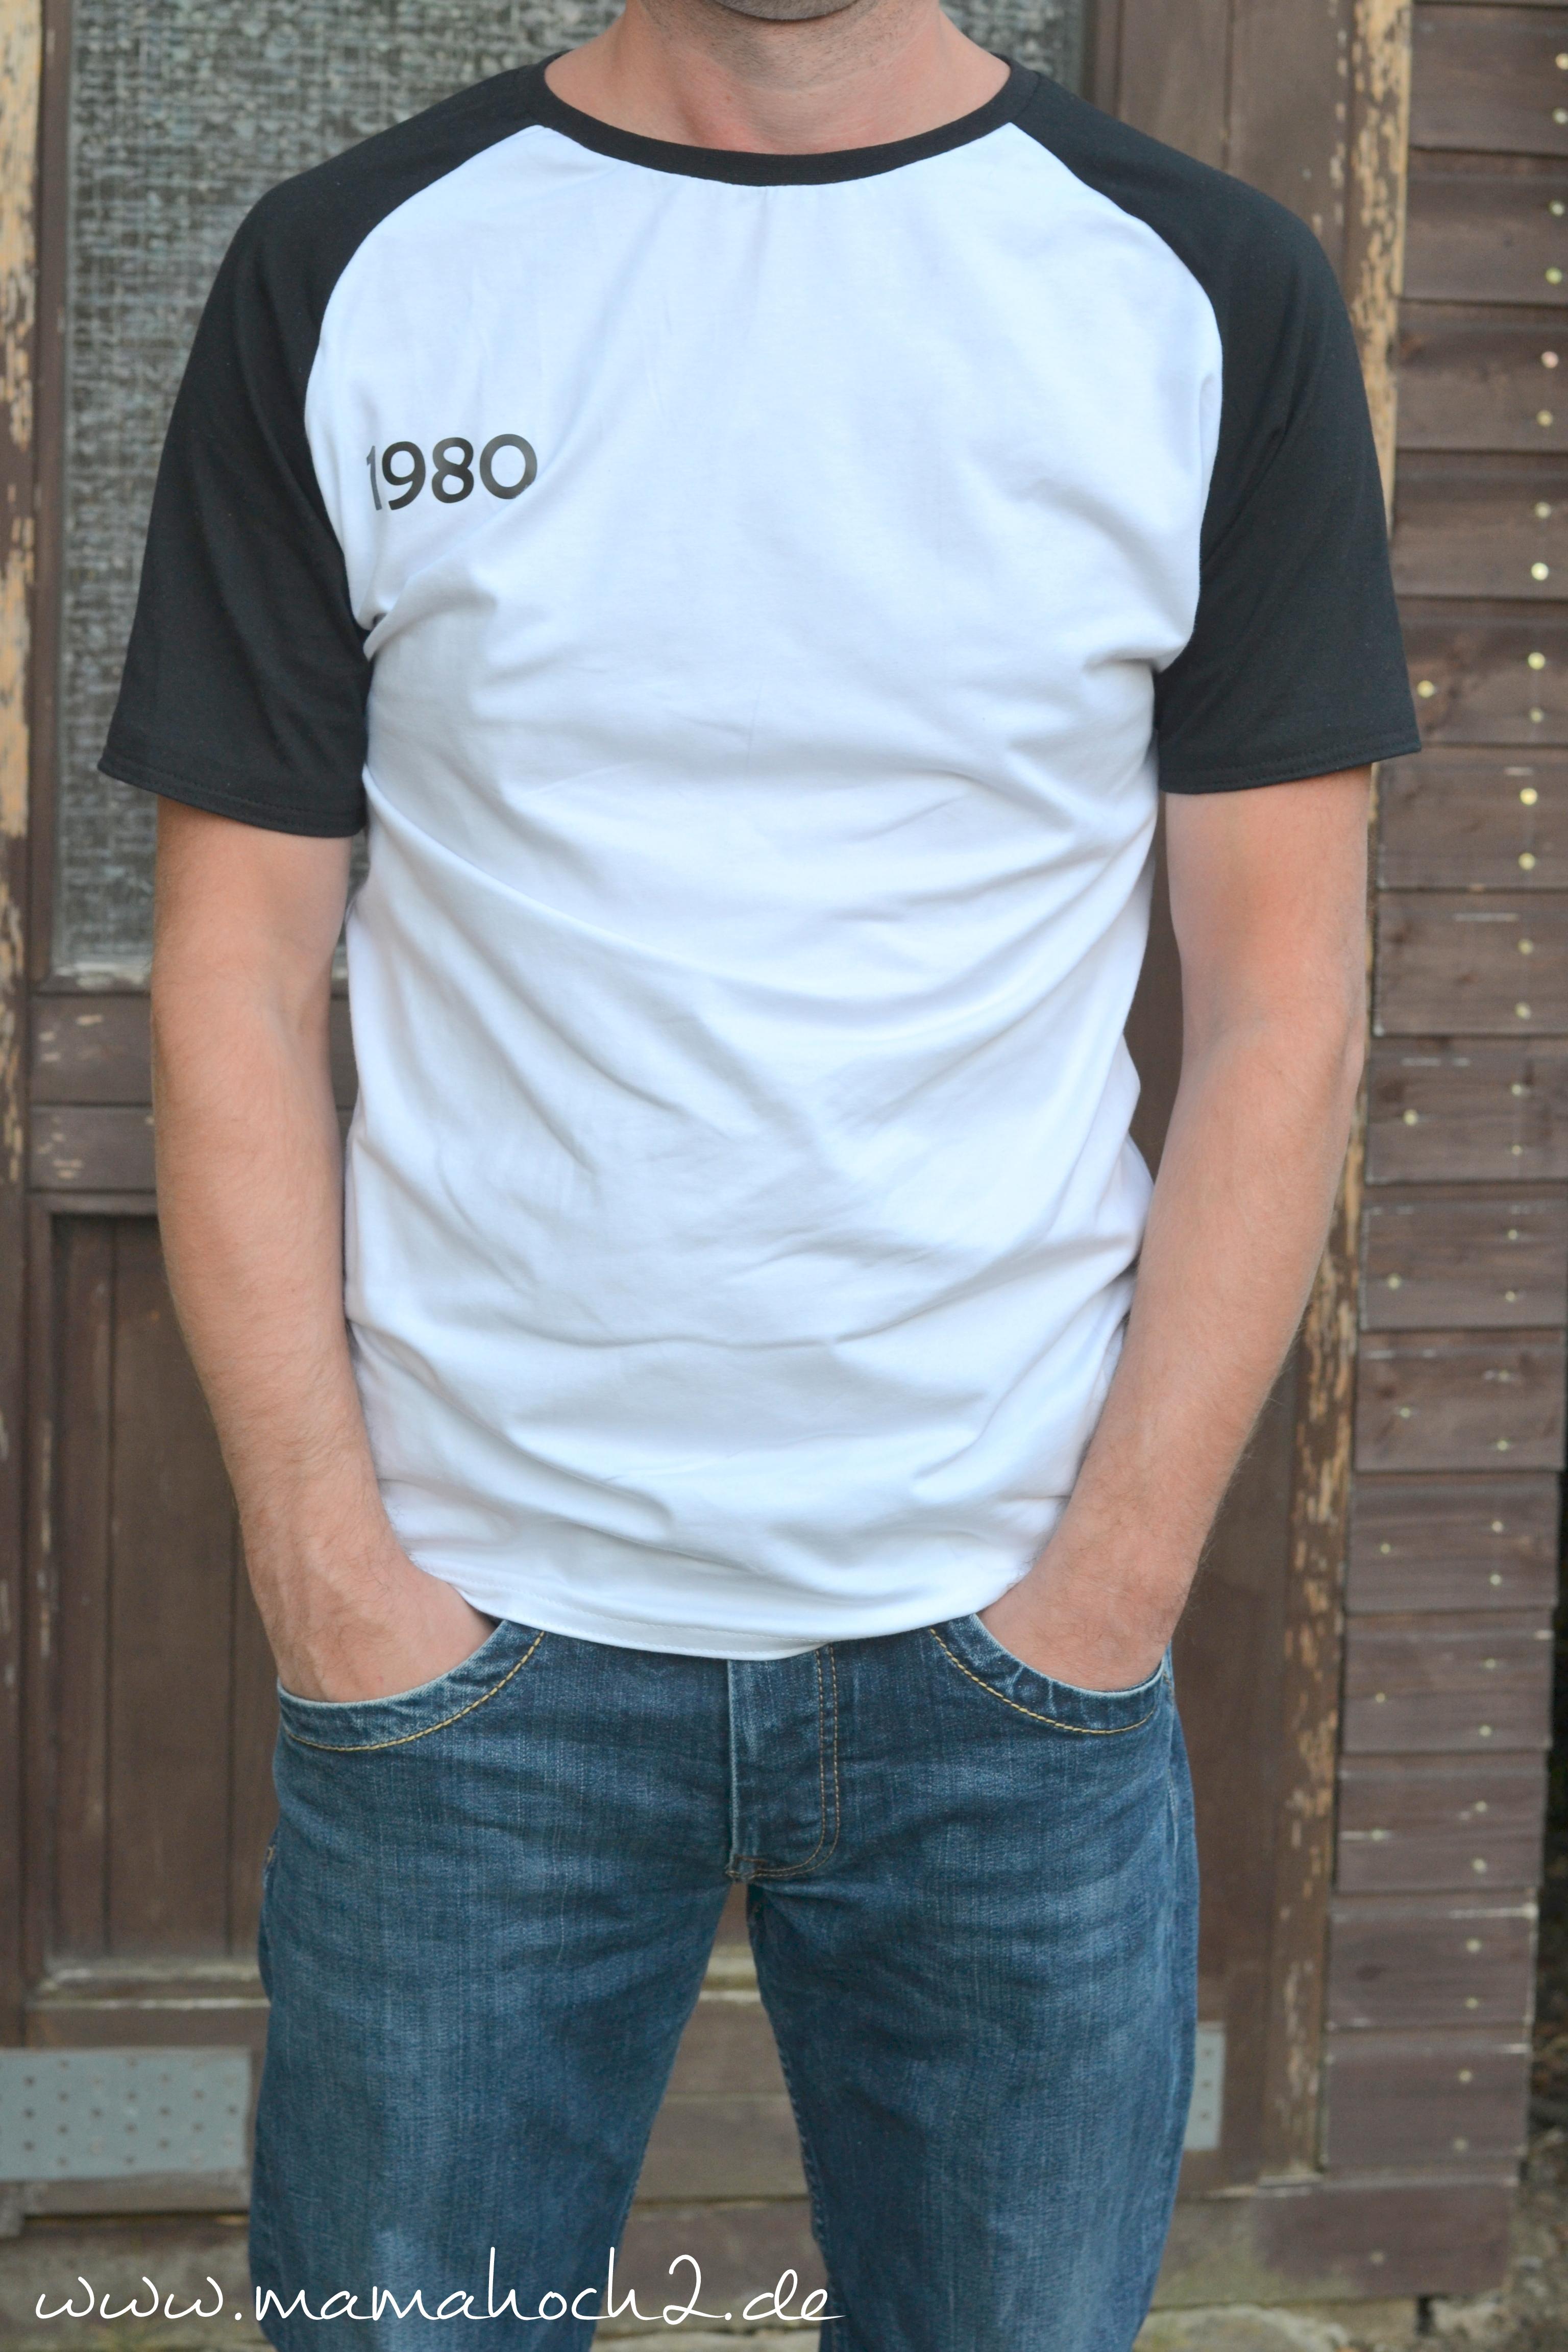 Nähen Für Den Sommer Der Rman Rockers Als T Shirt Mamahoch2